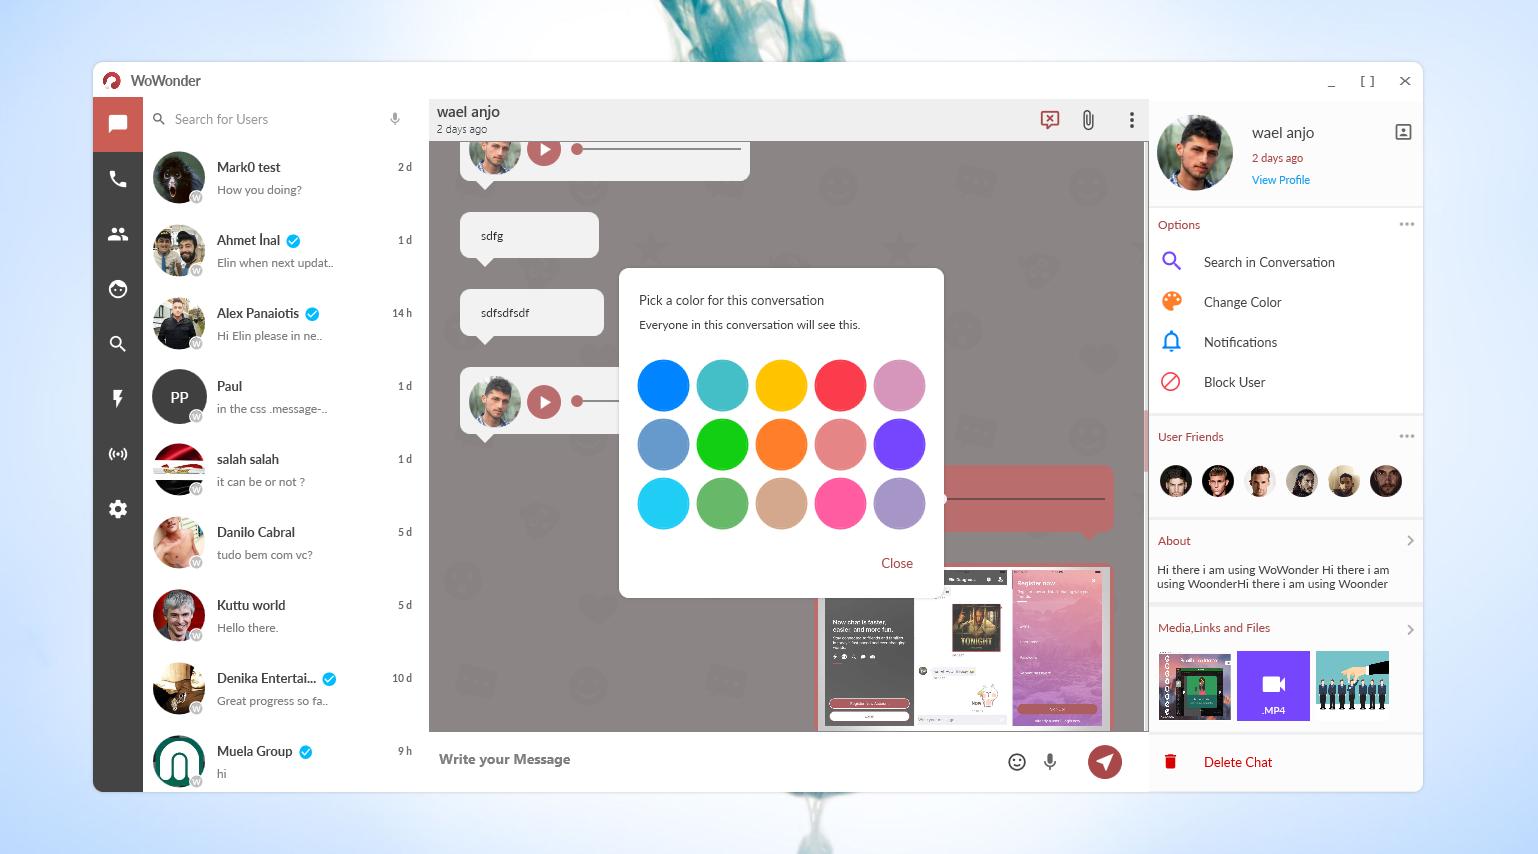 WoWonder Desktop - A Windows Messenger For WoWonder Social Script